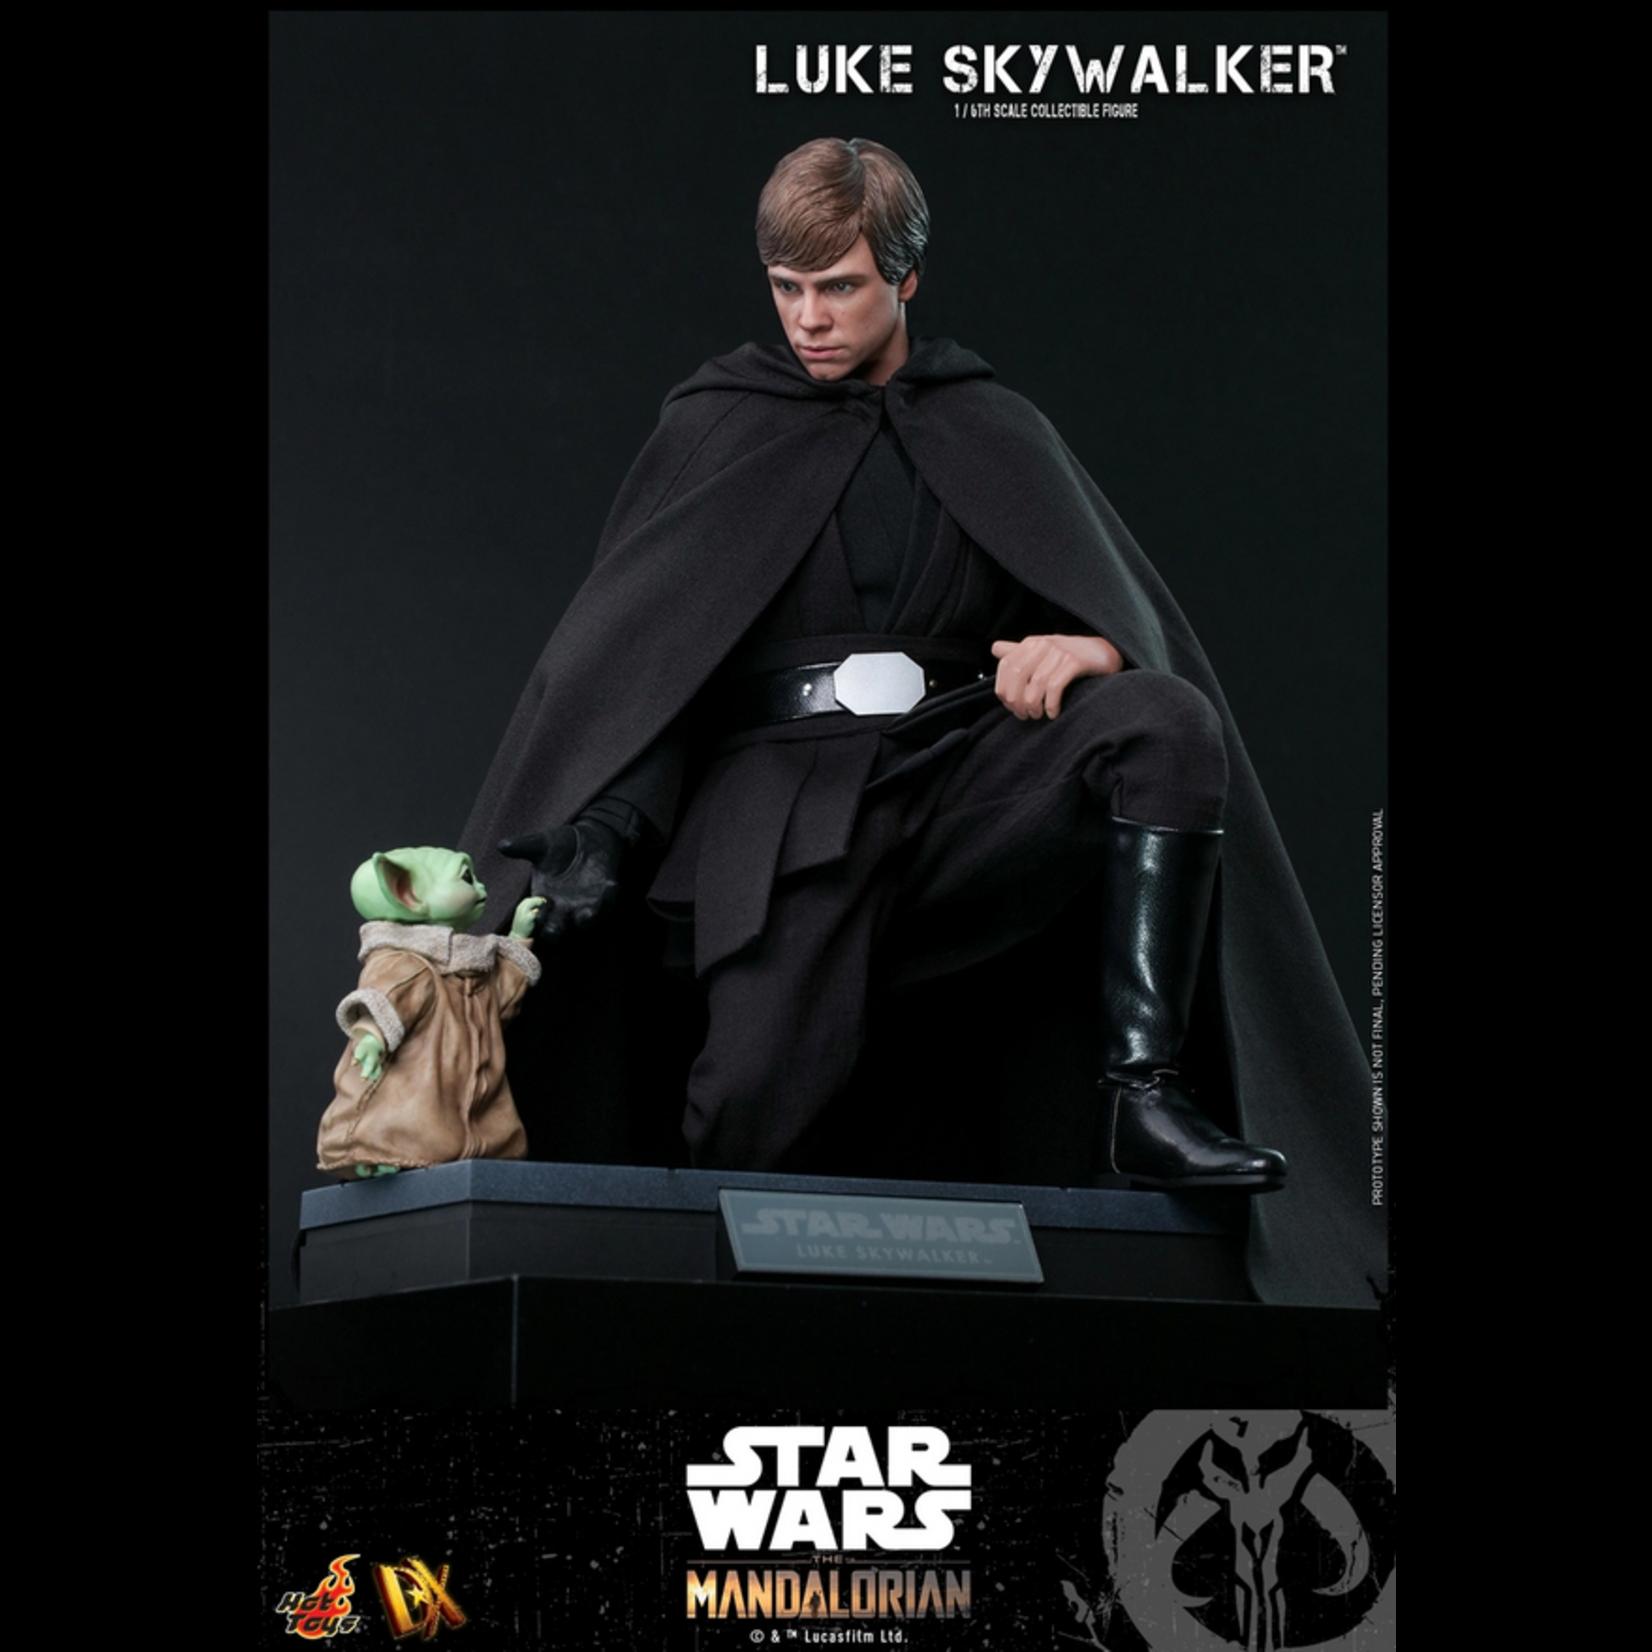 Hot Toys [Precommande] Hot Toys DX22 Star Wars: The Mandalorian™ Luke Skywalker